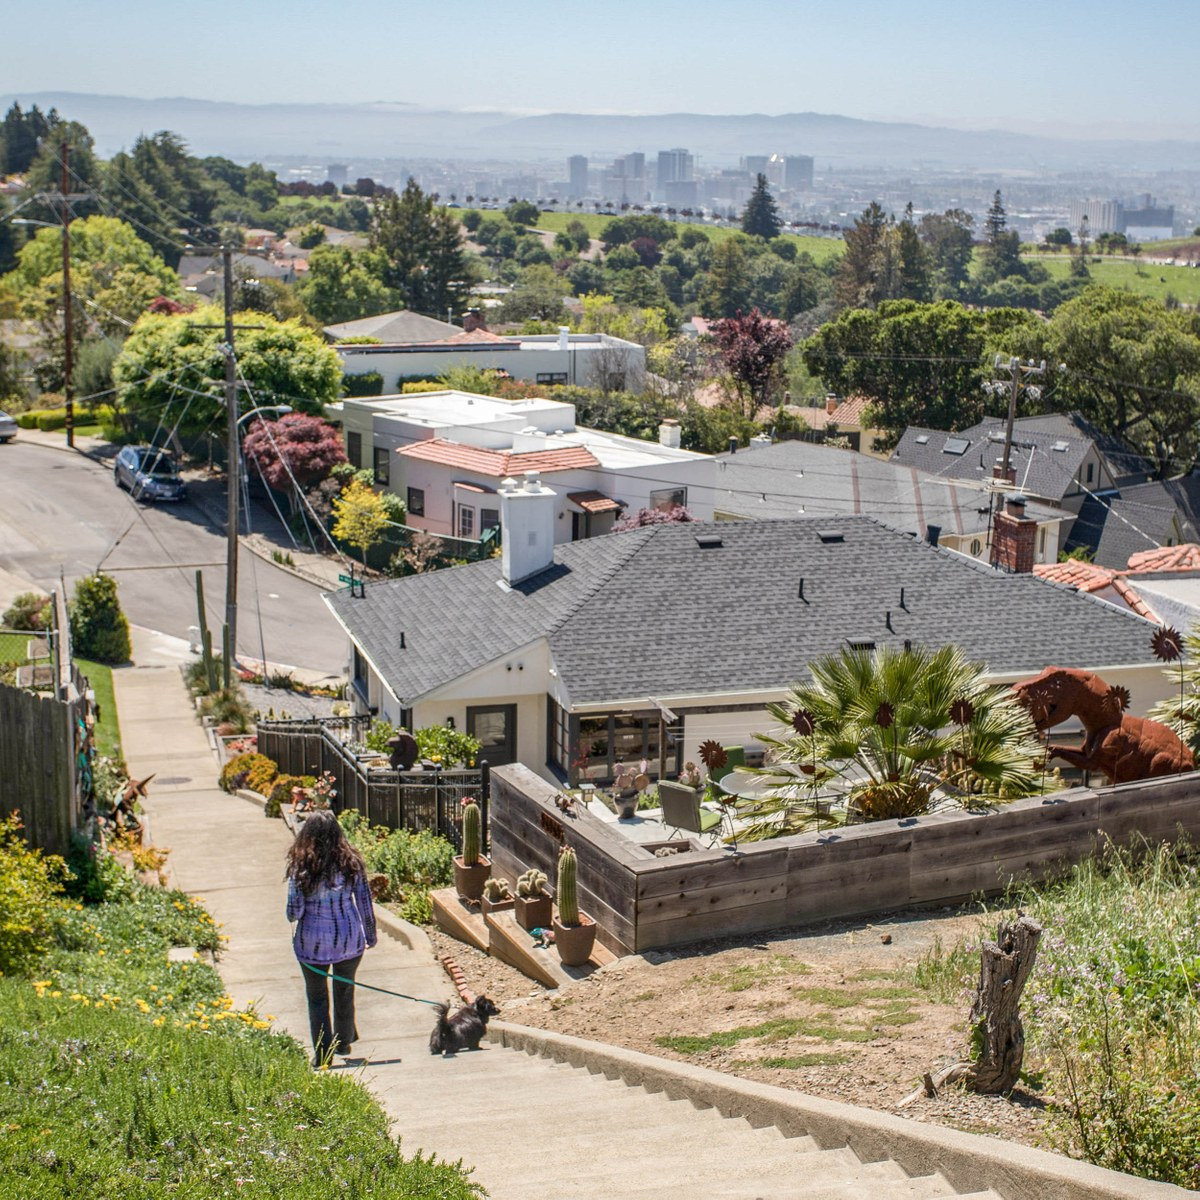 Local Com Homes For Rent: Upper Rockridge, Oakland CA - Neighborhood Guide